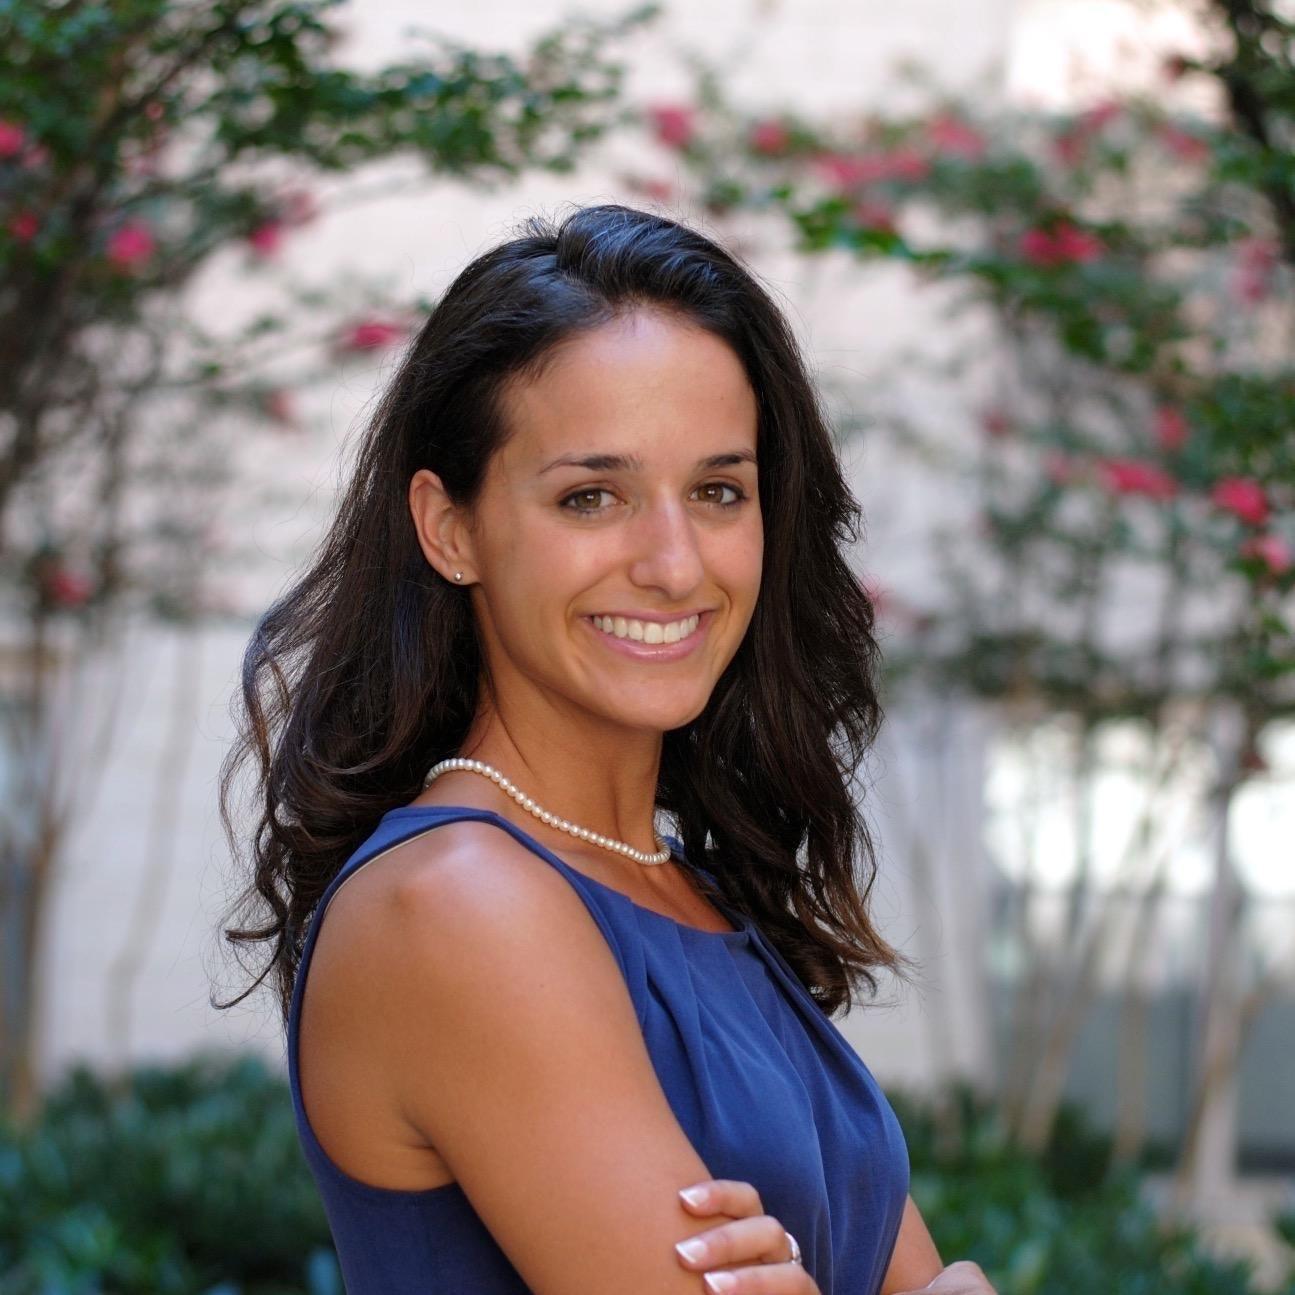 Laura Scaduto